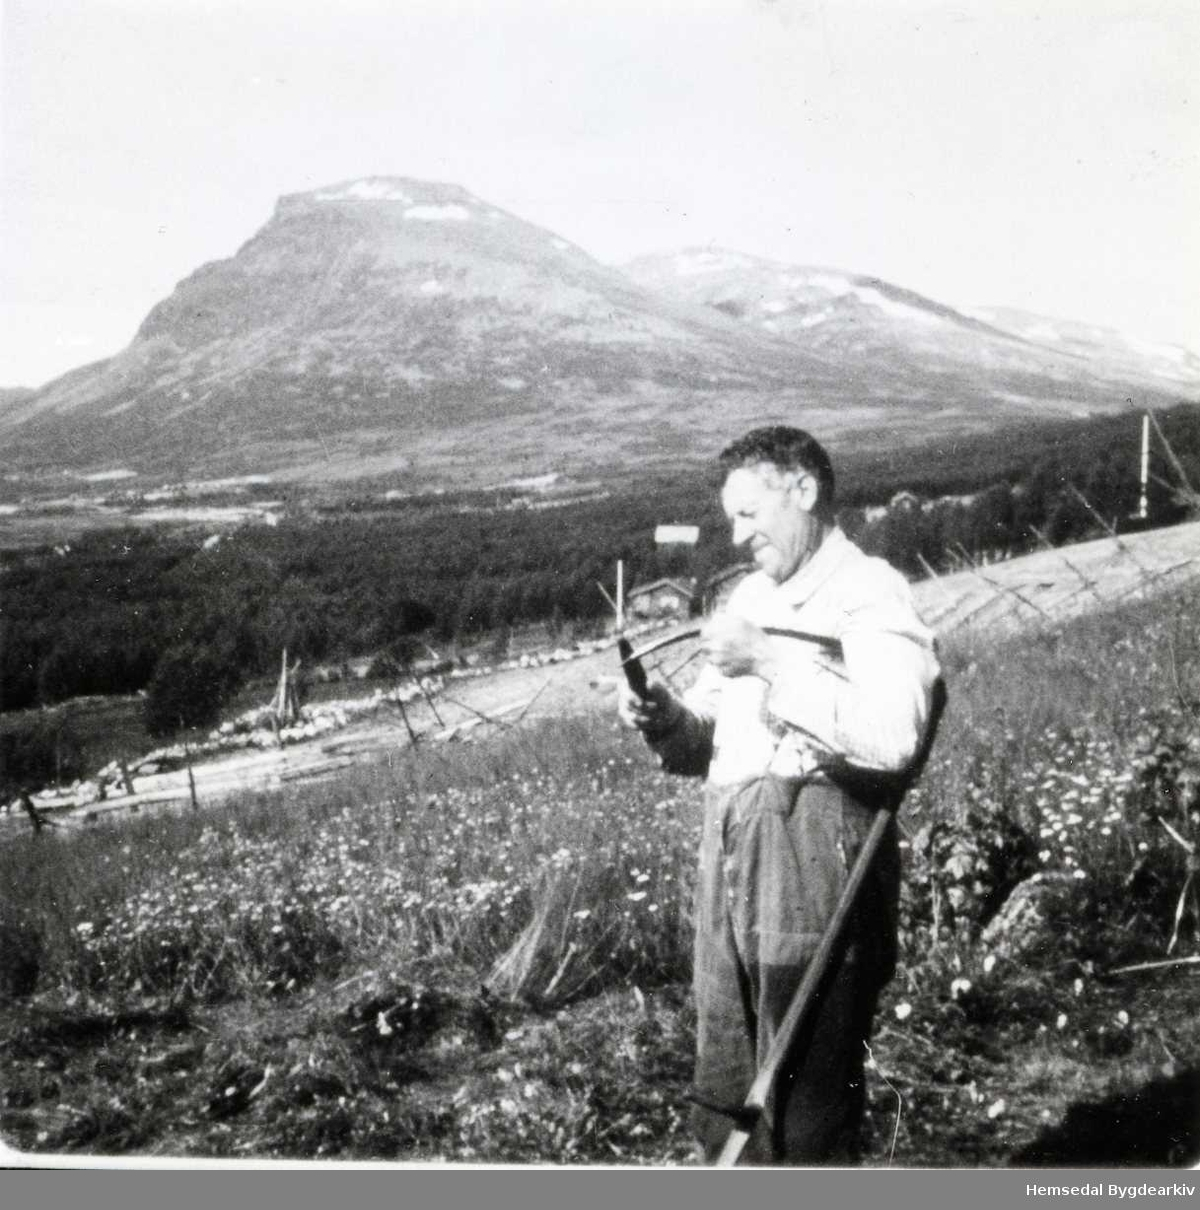 Halvor K. Mythe på Jonstølane i Hemsedal i 1965